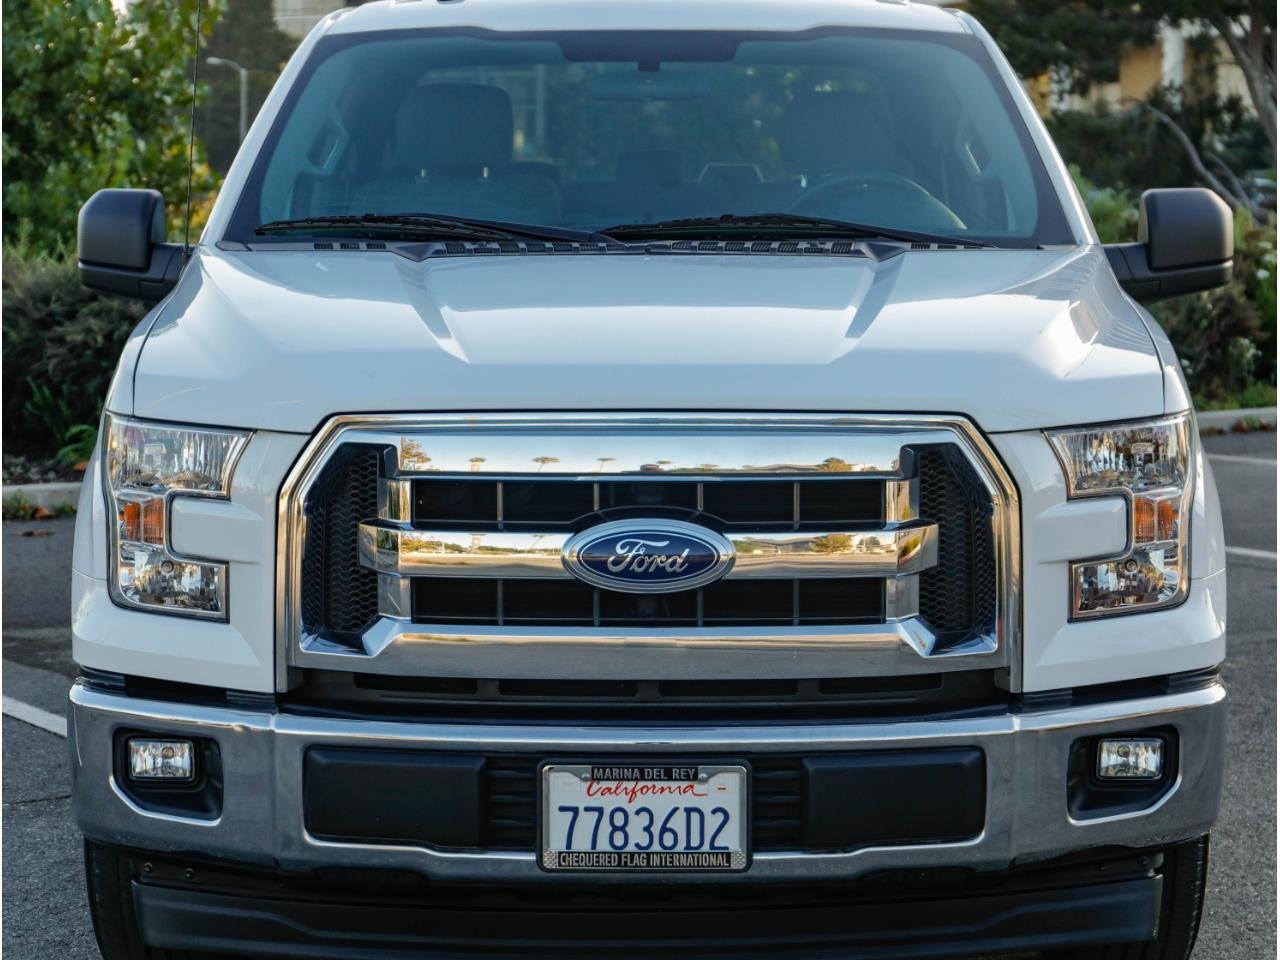 2017 Ford F150 (CC-1276387) for sale in Marina Del Rey, California